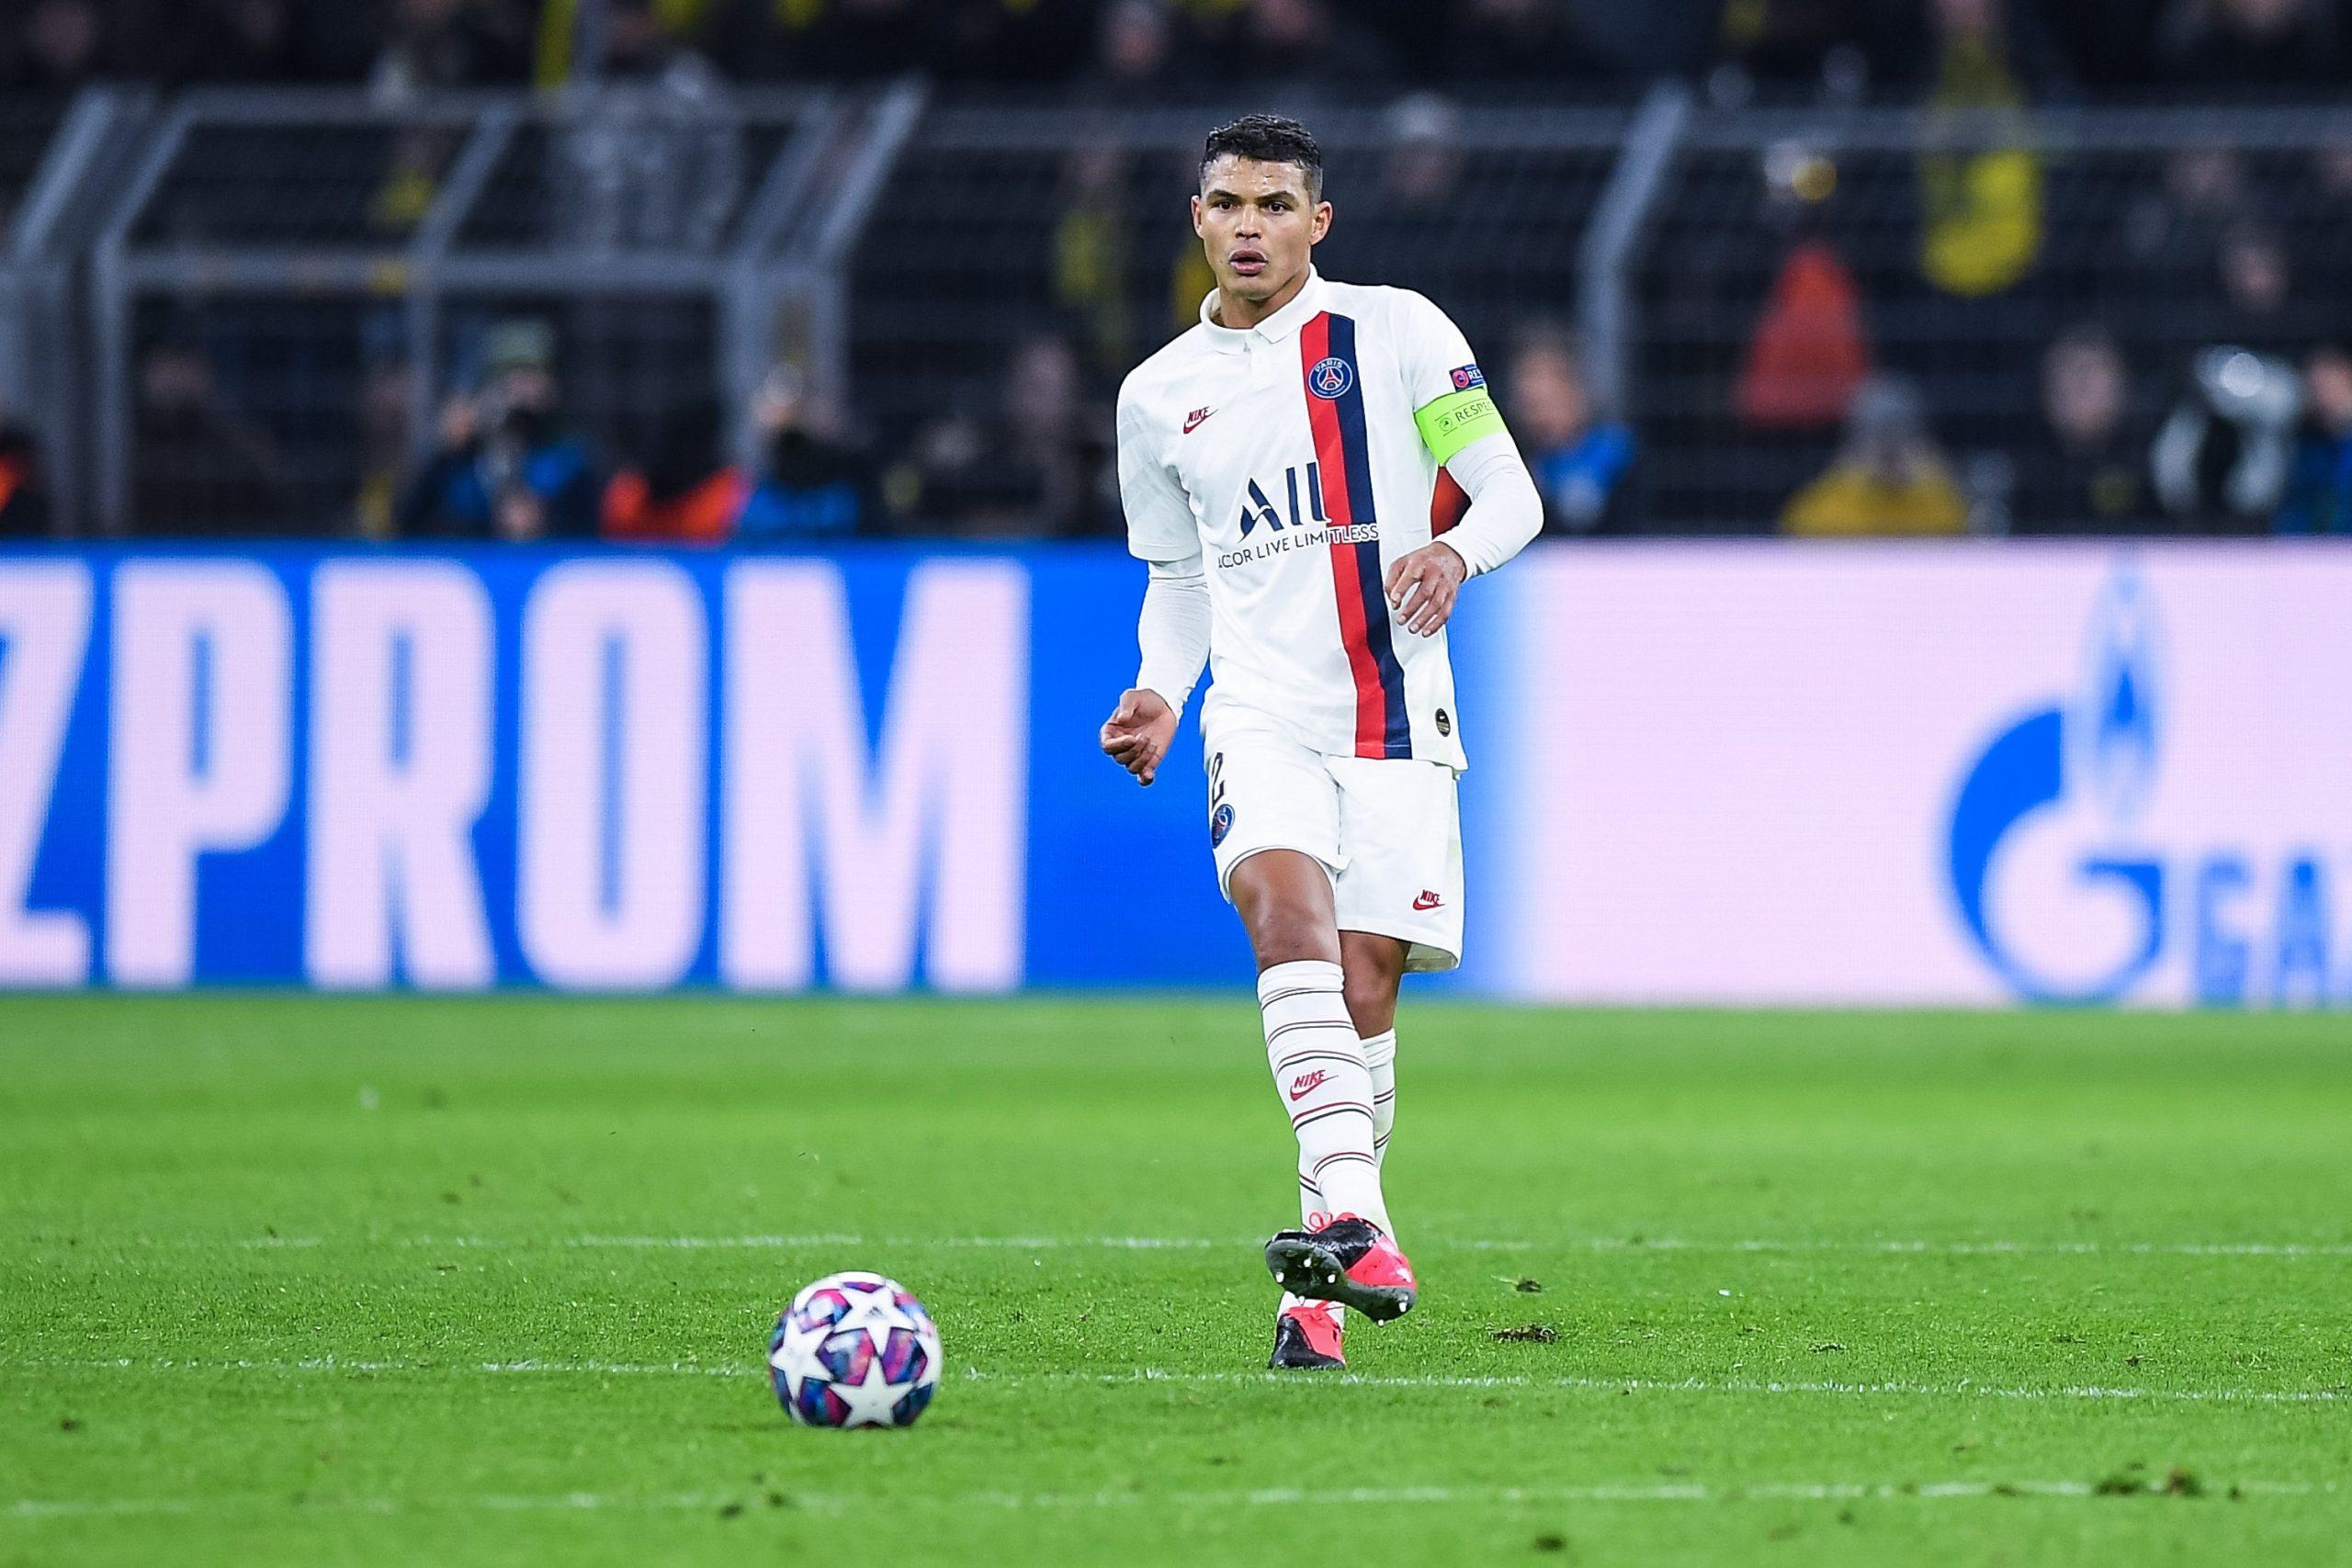 Mercato - Thiago Silva serait en contact avec Everton, où il retrouverait Ancelotti